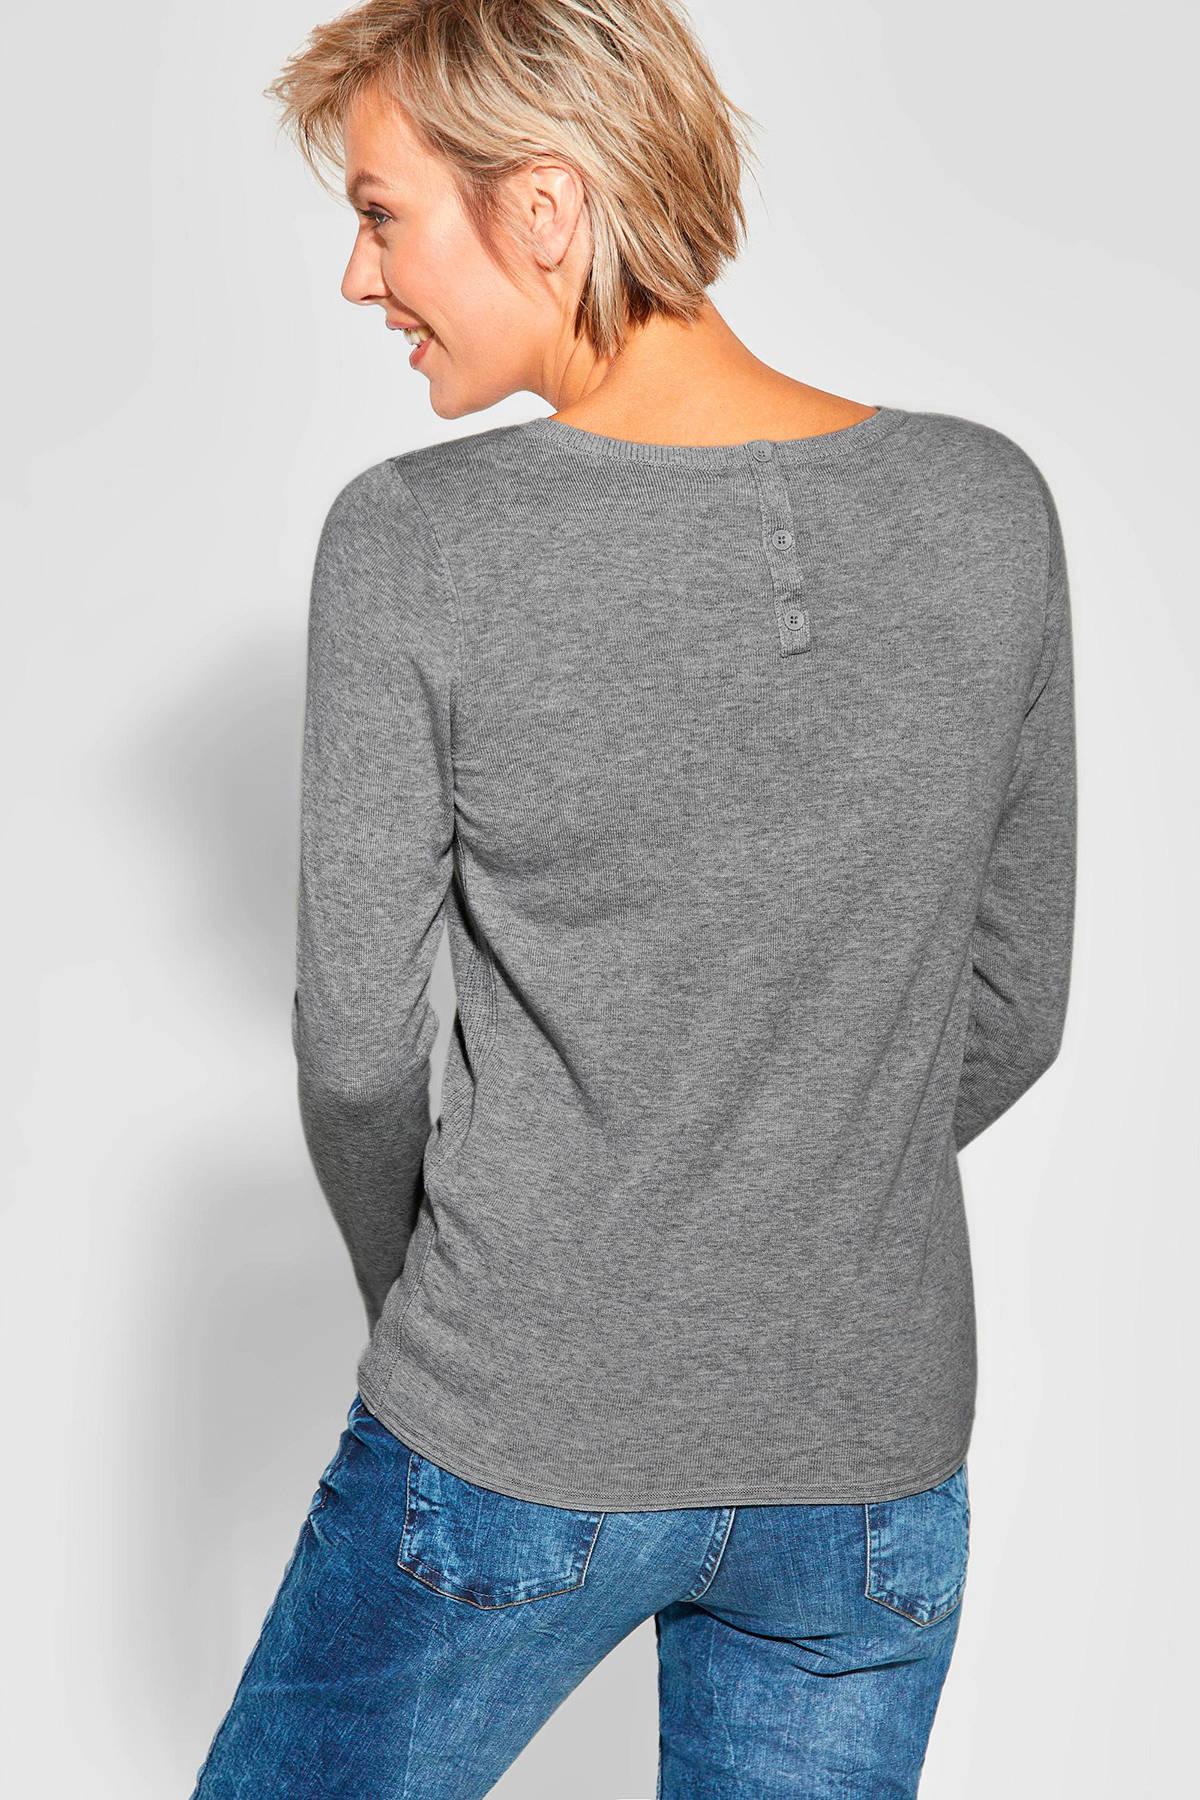 CECIL fijngebreide trui Alena grijs | wehkamp